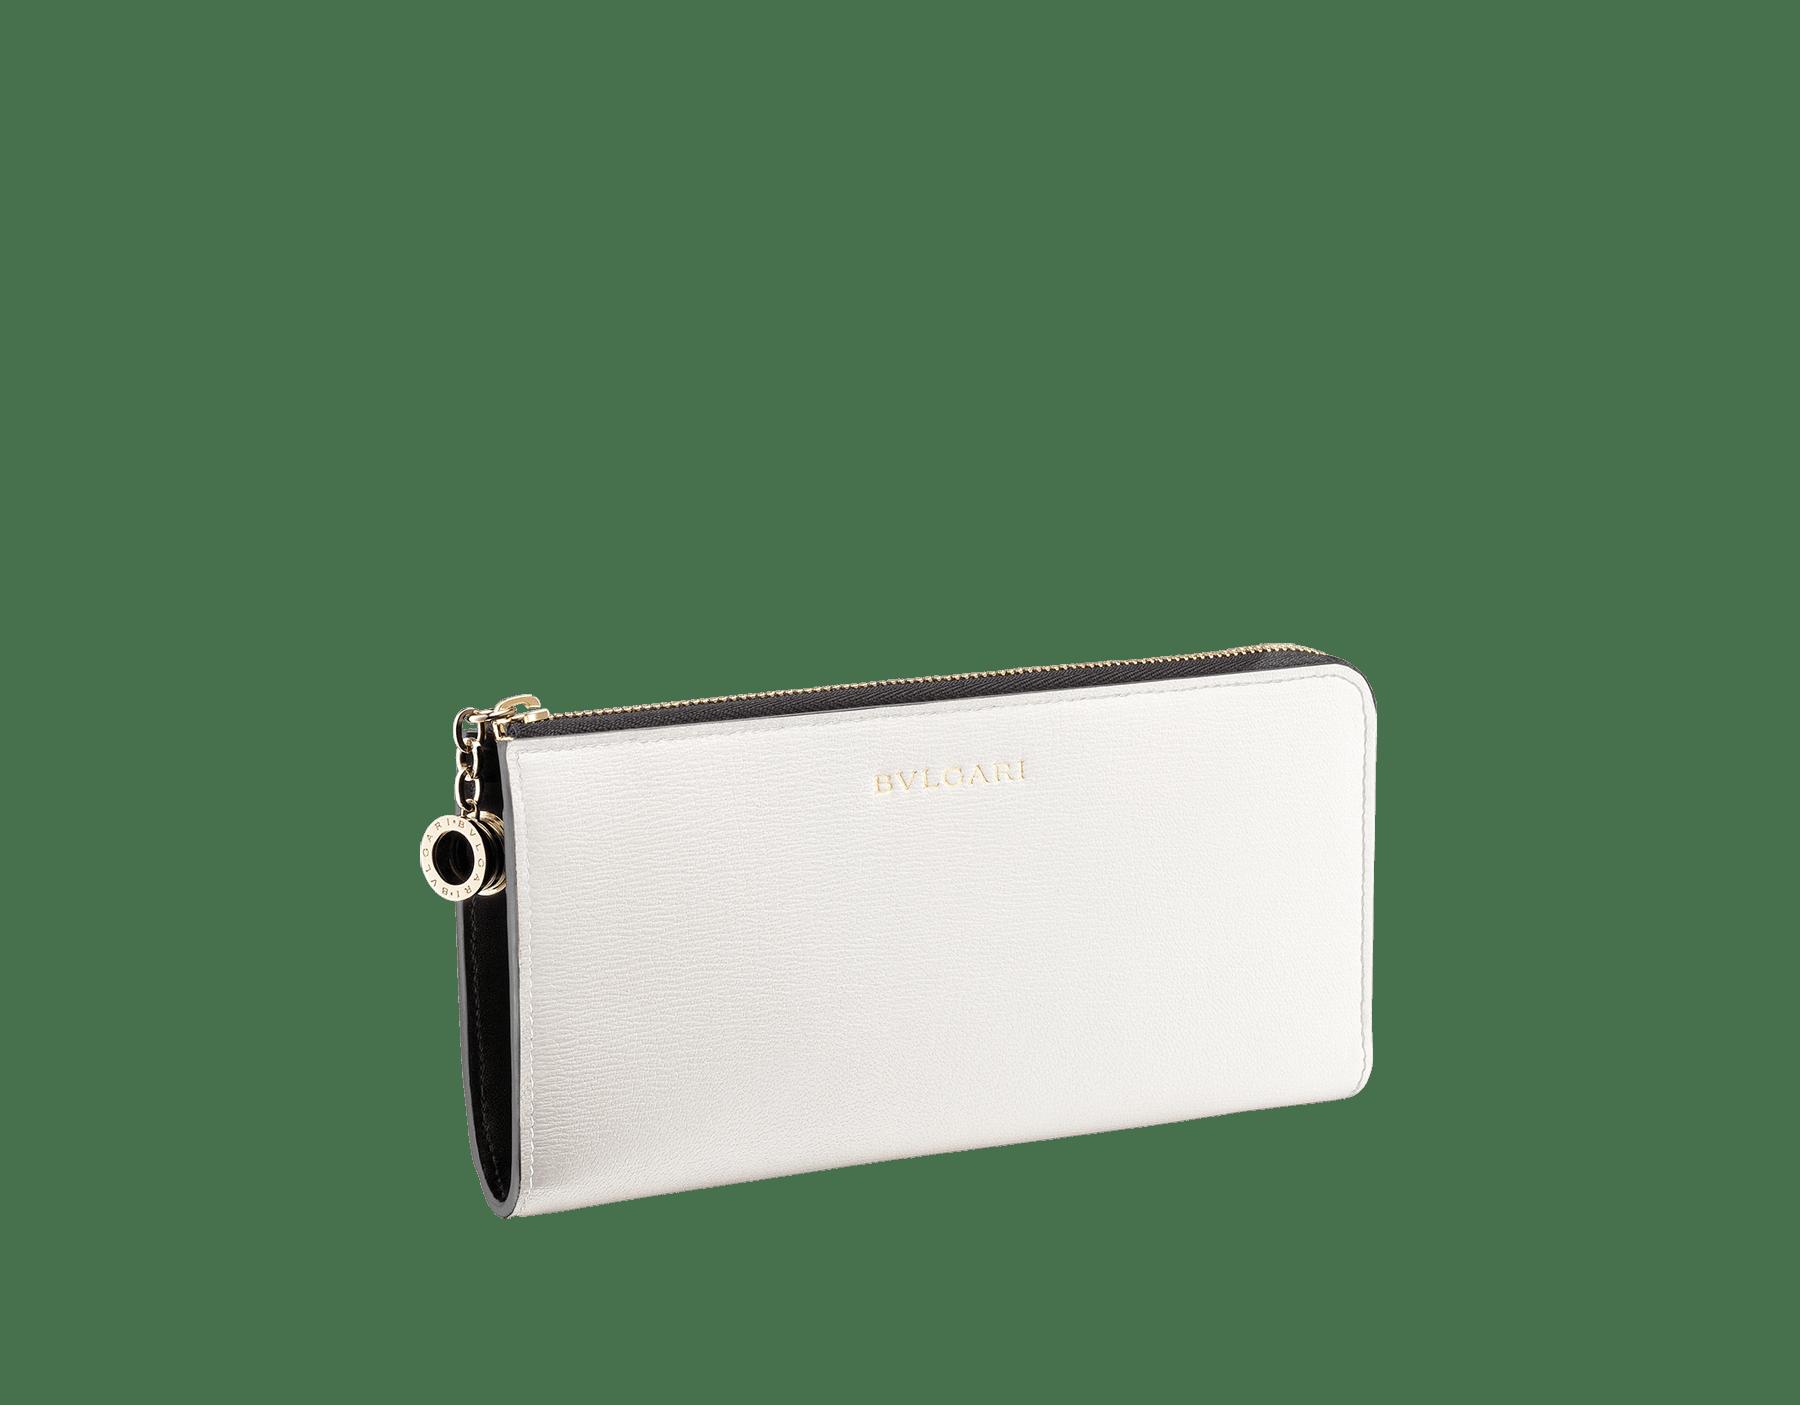 B.zero1 L-shaped zipped wallet in daisy topaz, taffy quartz goatskin and taffy quartz nappa. Iconic B.zero1 zip puller in light gold-plated brass. BZA-WLT-MZP-SLIM-L image 1